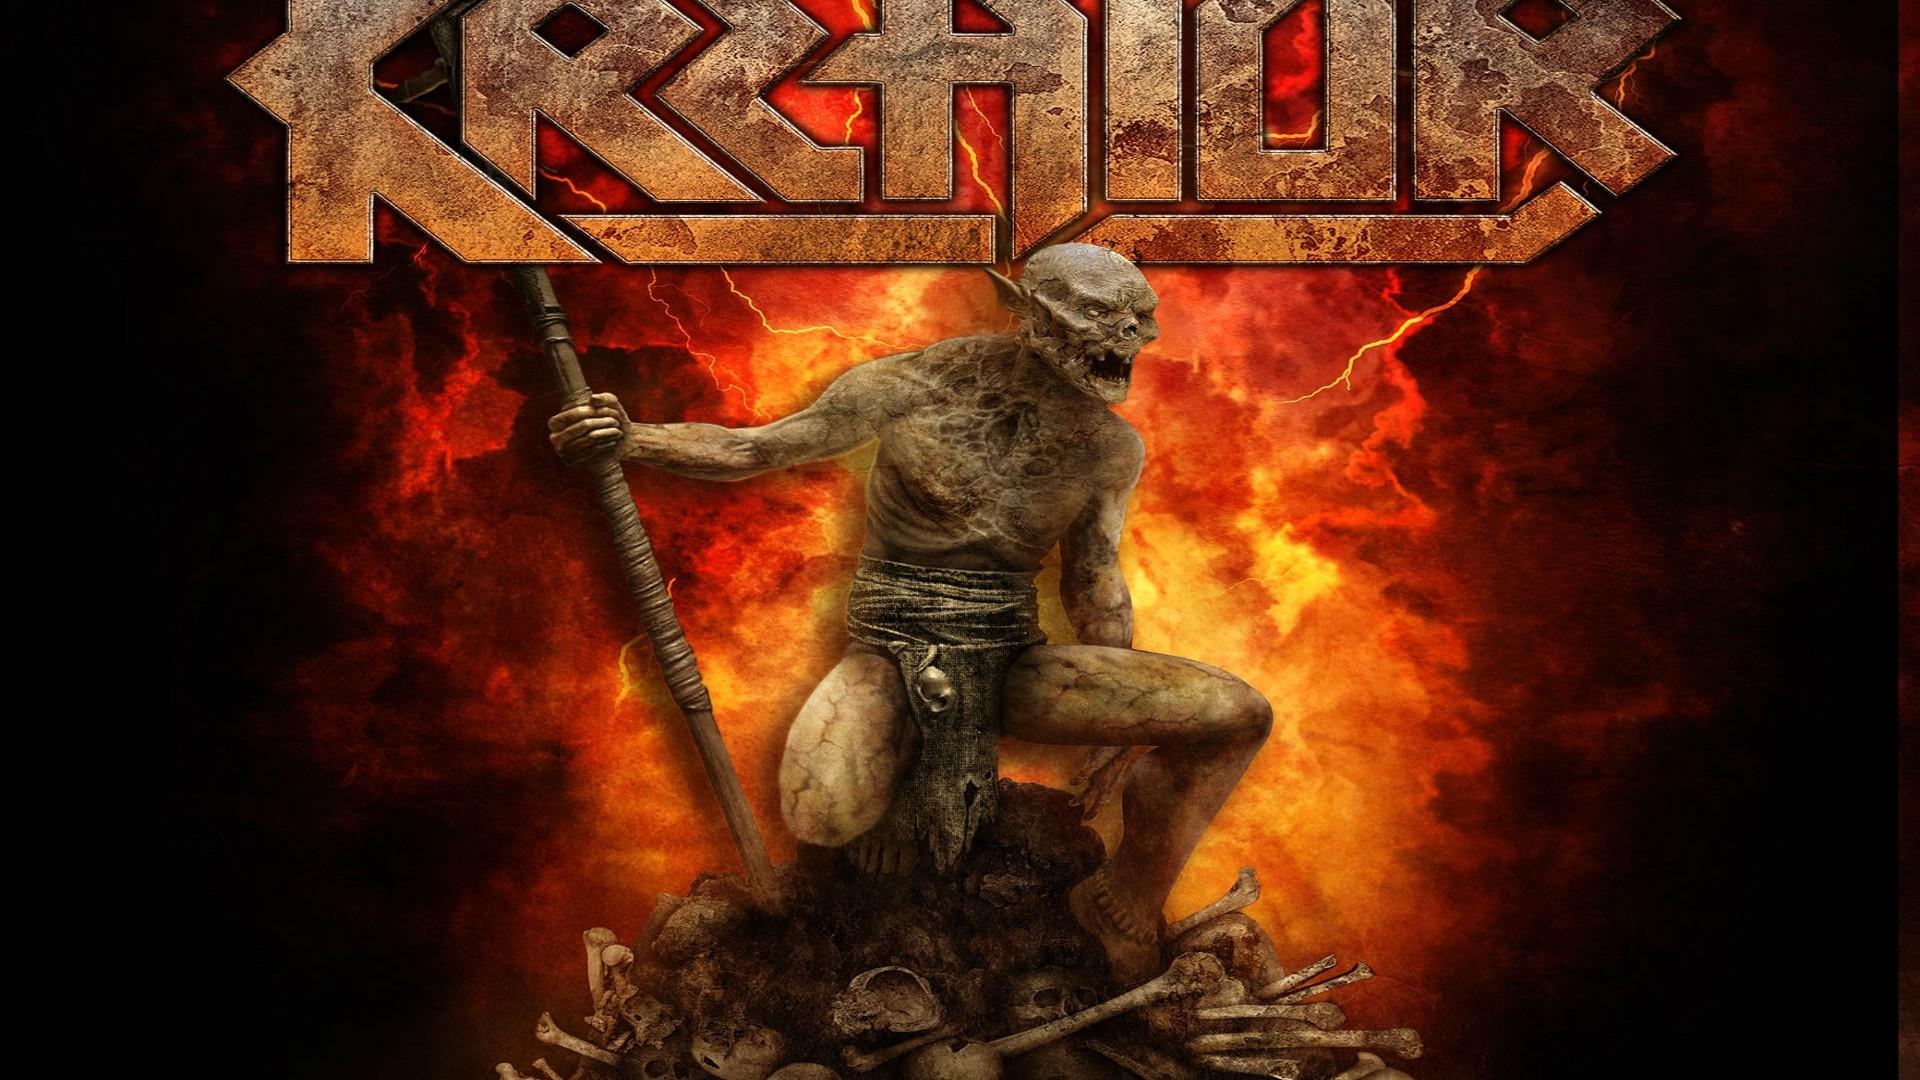 Res: 1920x1080, KREATOR thrash metal heavy hd wallpaper 1920x1440 1920x1440. Download  resolutions: Desktop:  ...